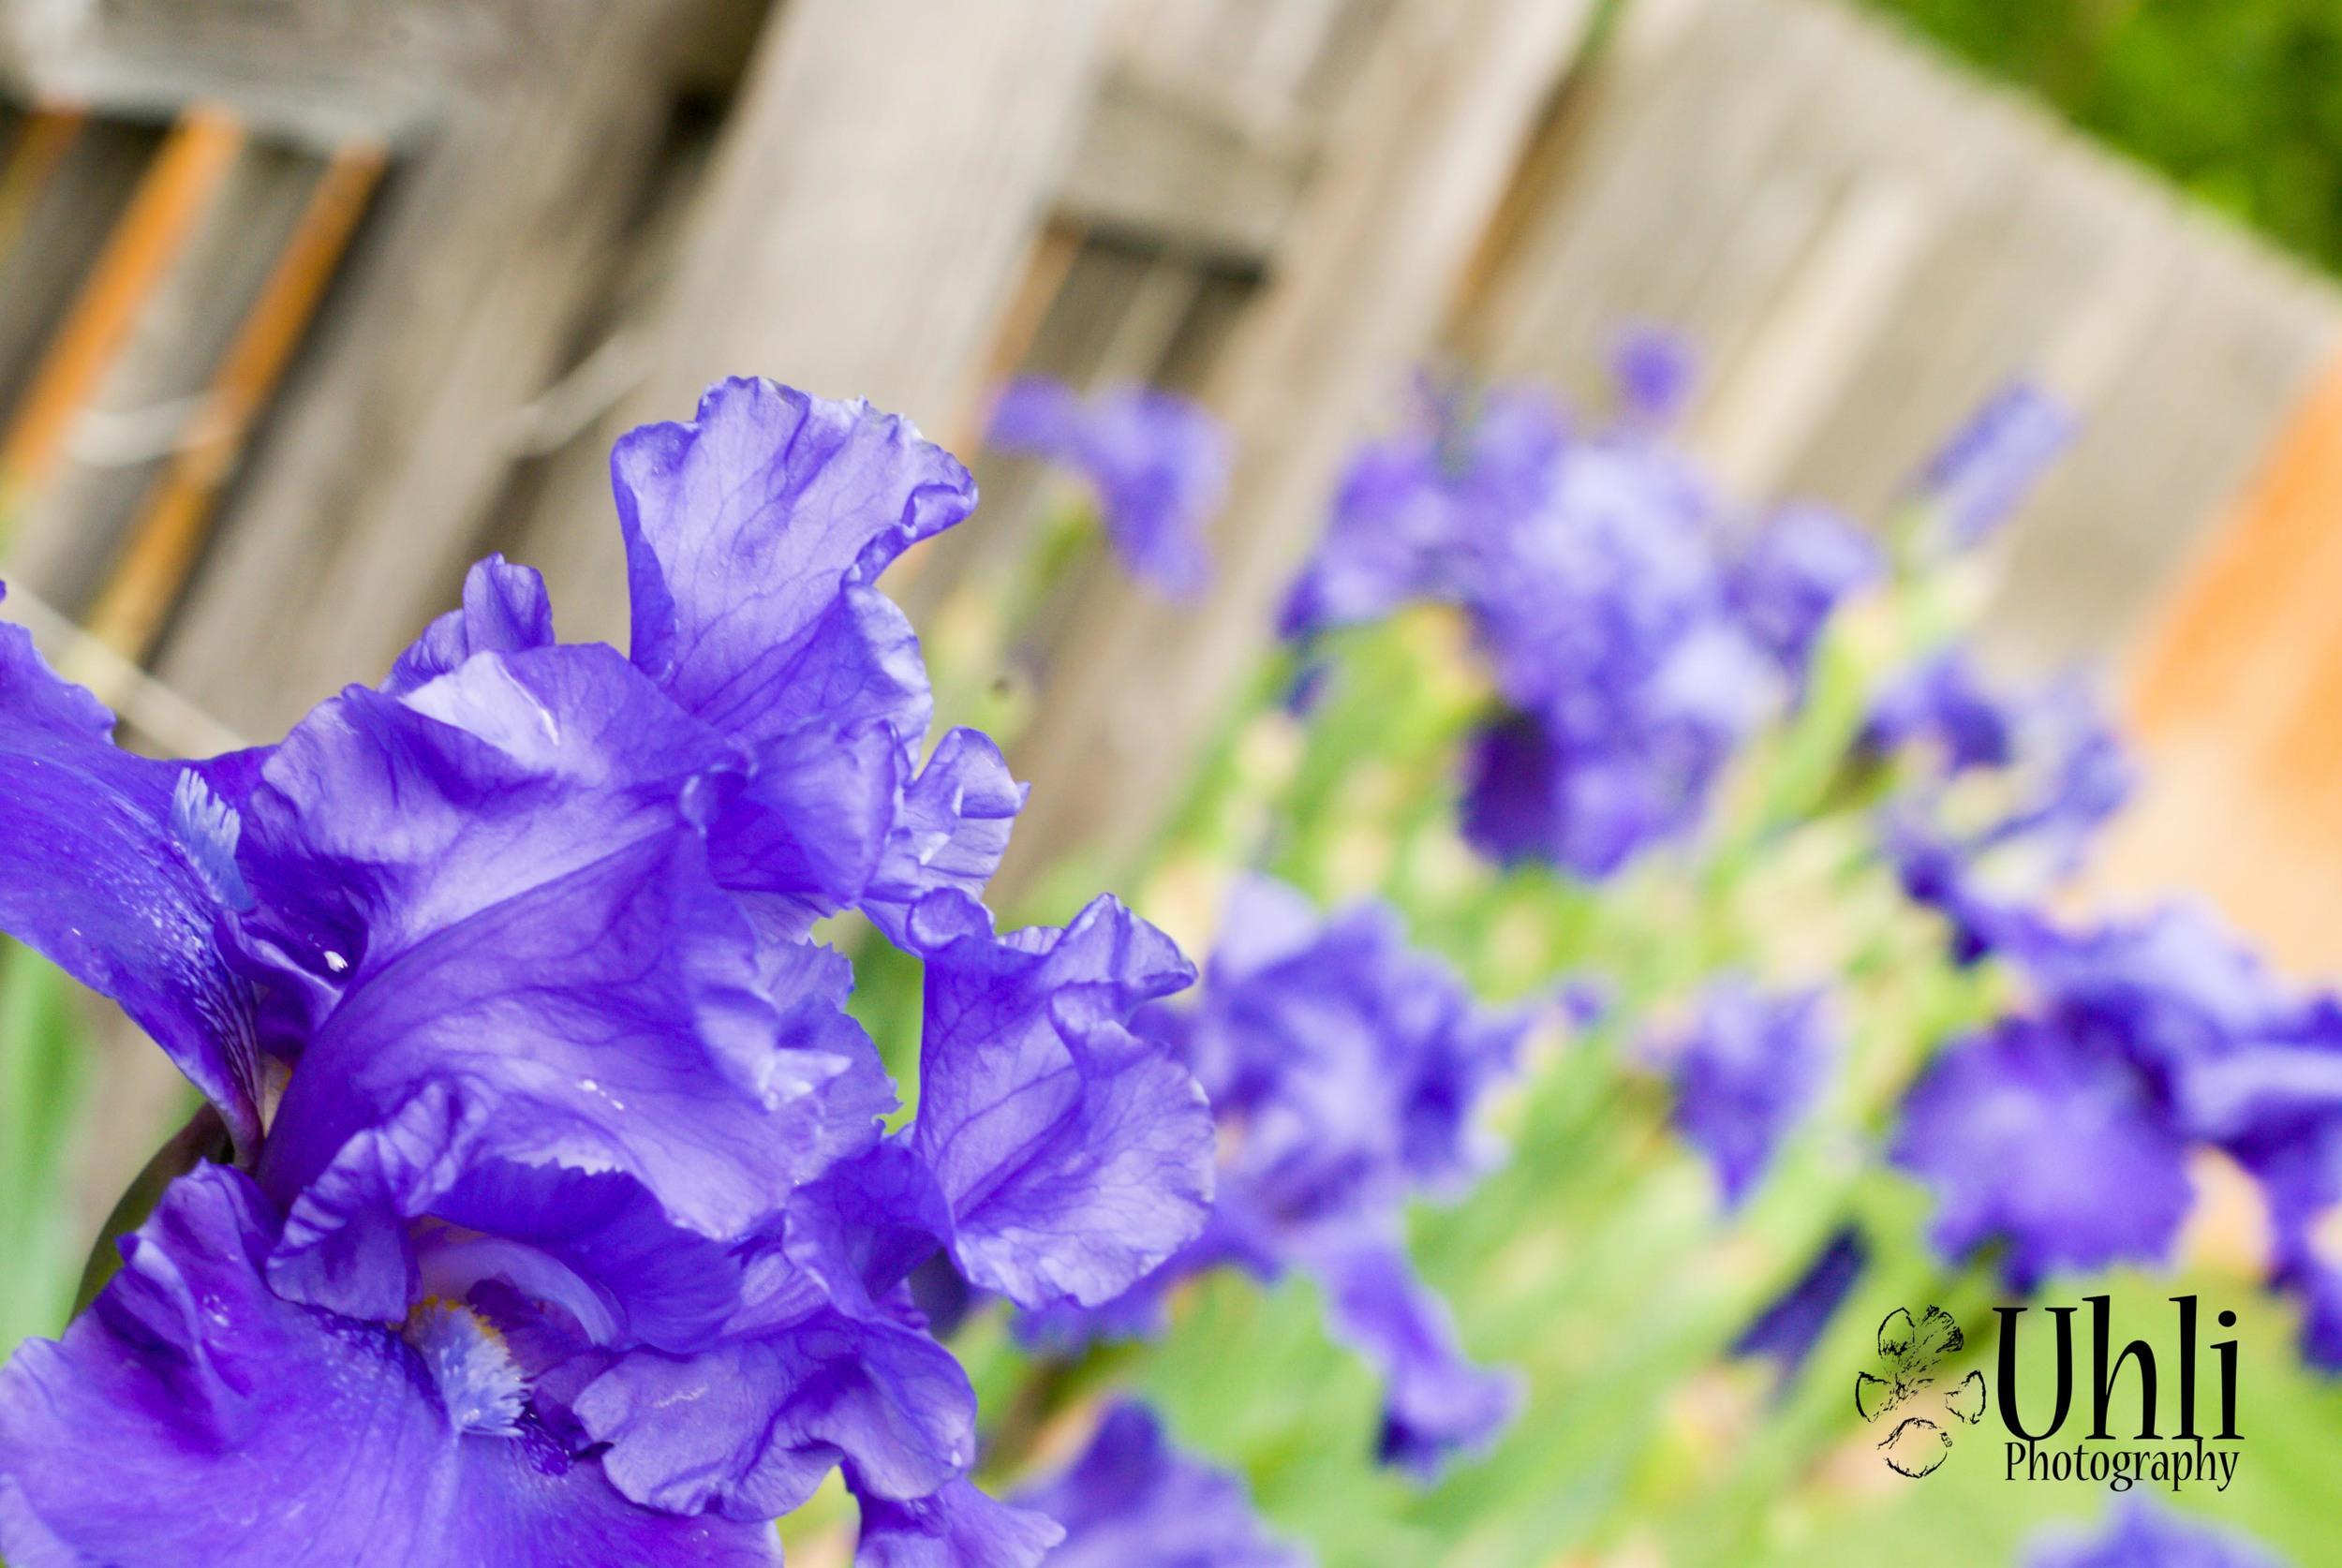 6.5.13 - Neighborhood Irises, they add a splash of color